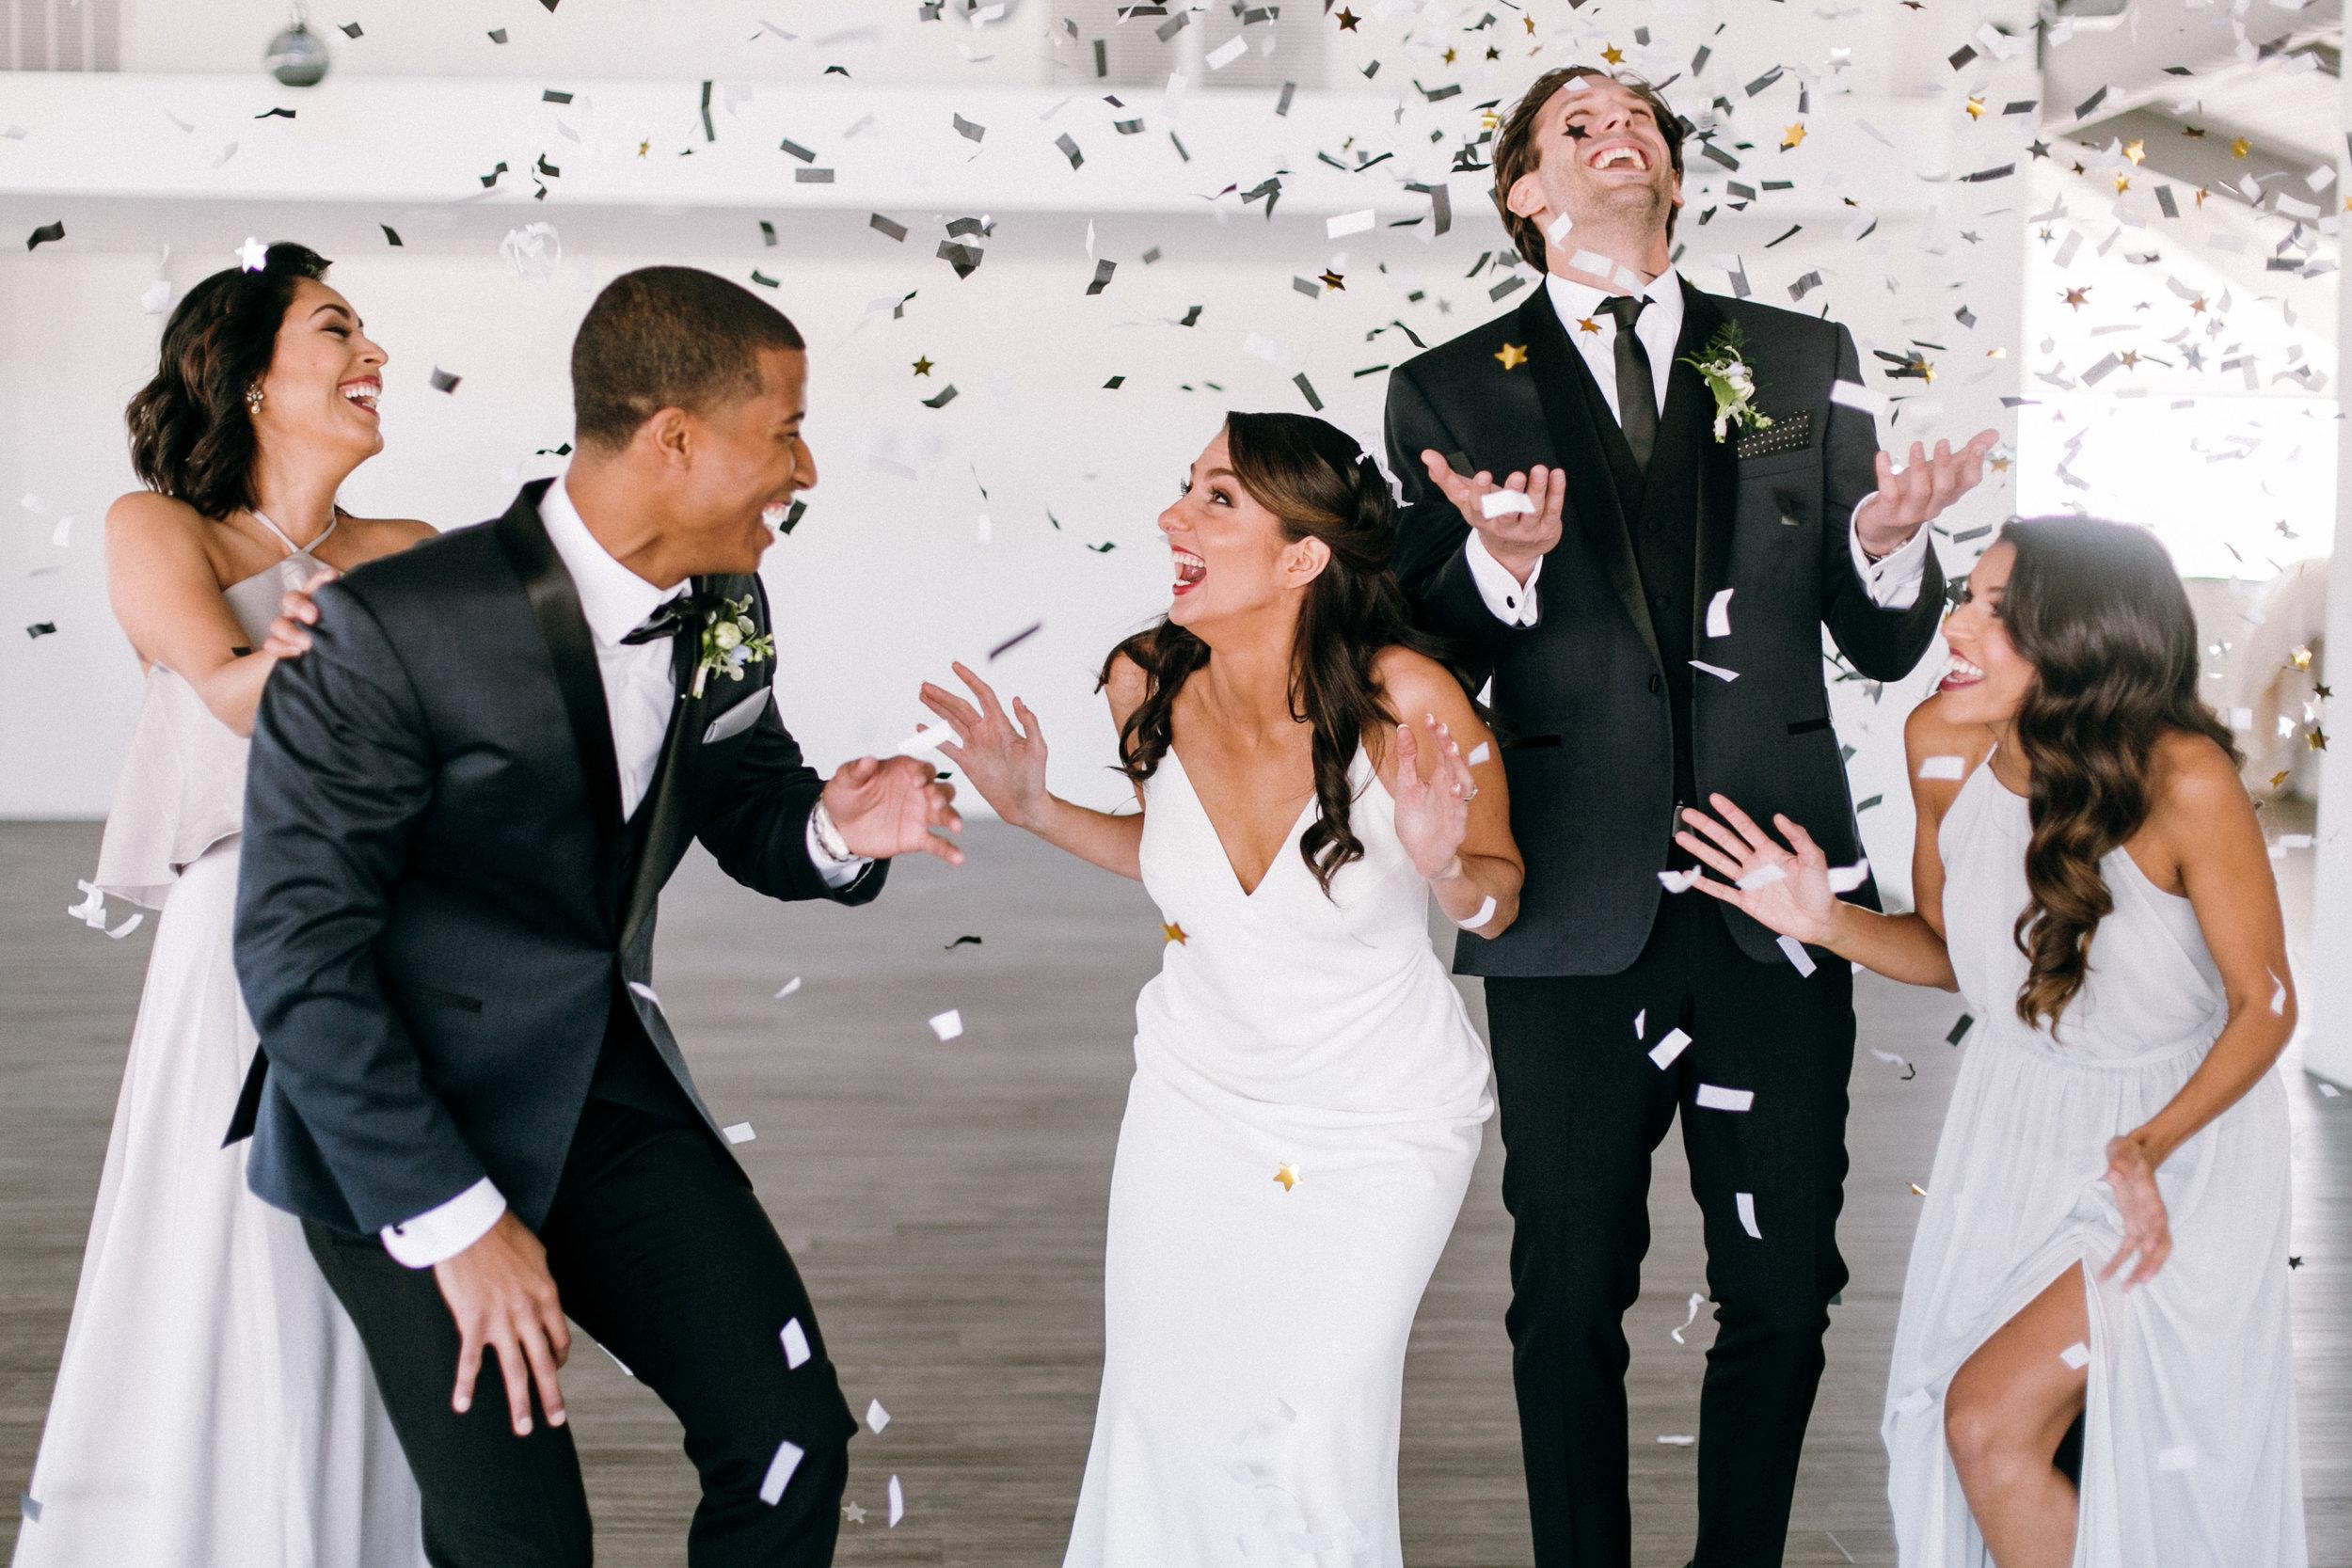 OC wedding photographer, Southern California wedding photographer, Orange County wedding photographer, SoCal wedding photographer, Huntington Beach wedding photographer, Huntington Bay Club